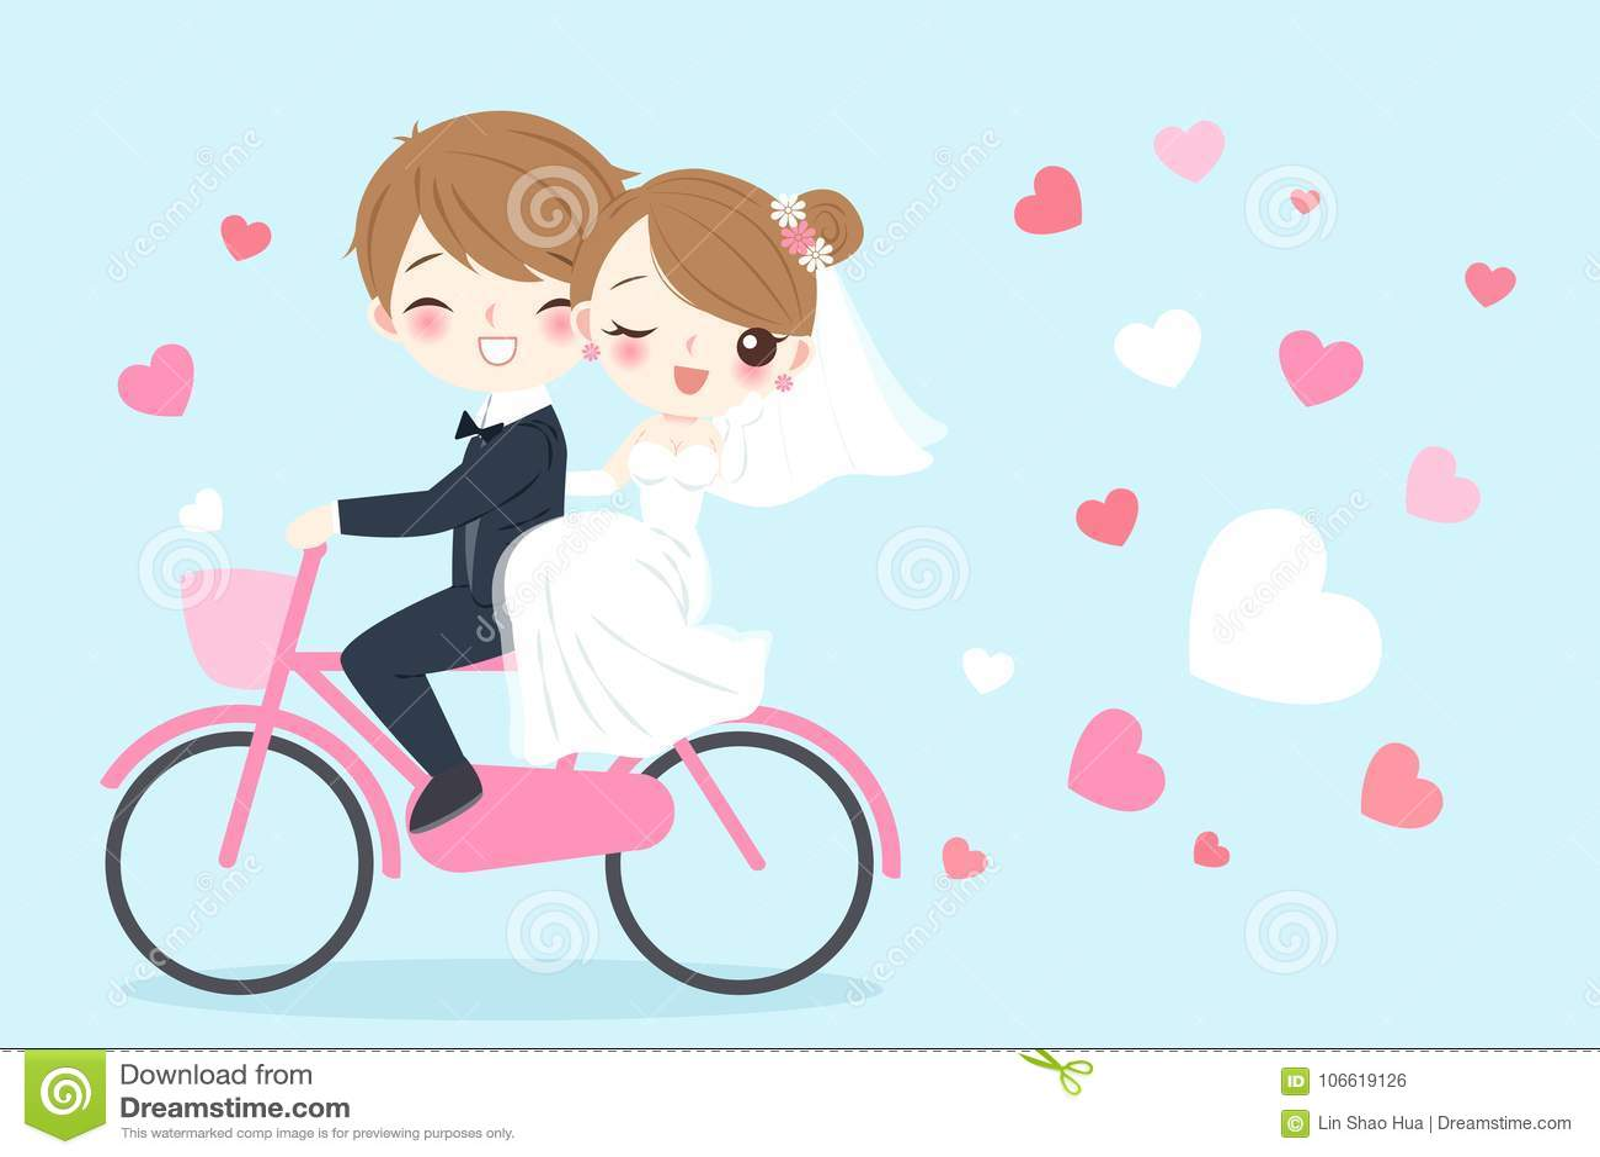 Cartoon Wedding People Stock Illustration Illustration Of